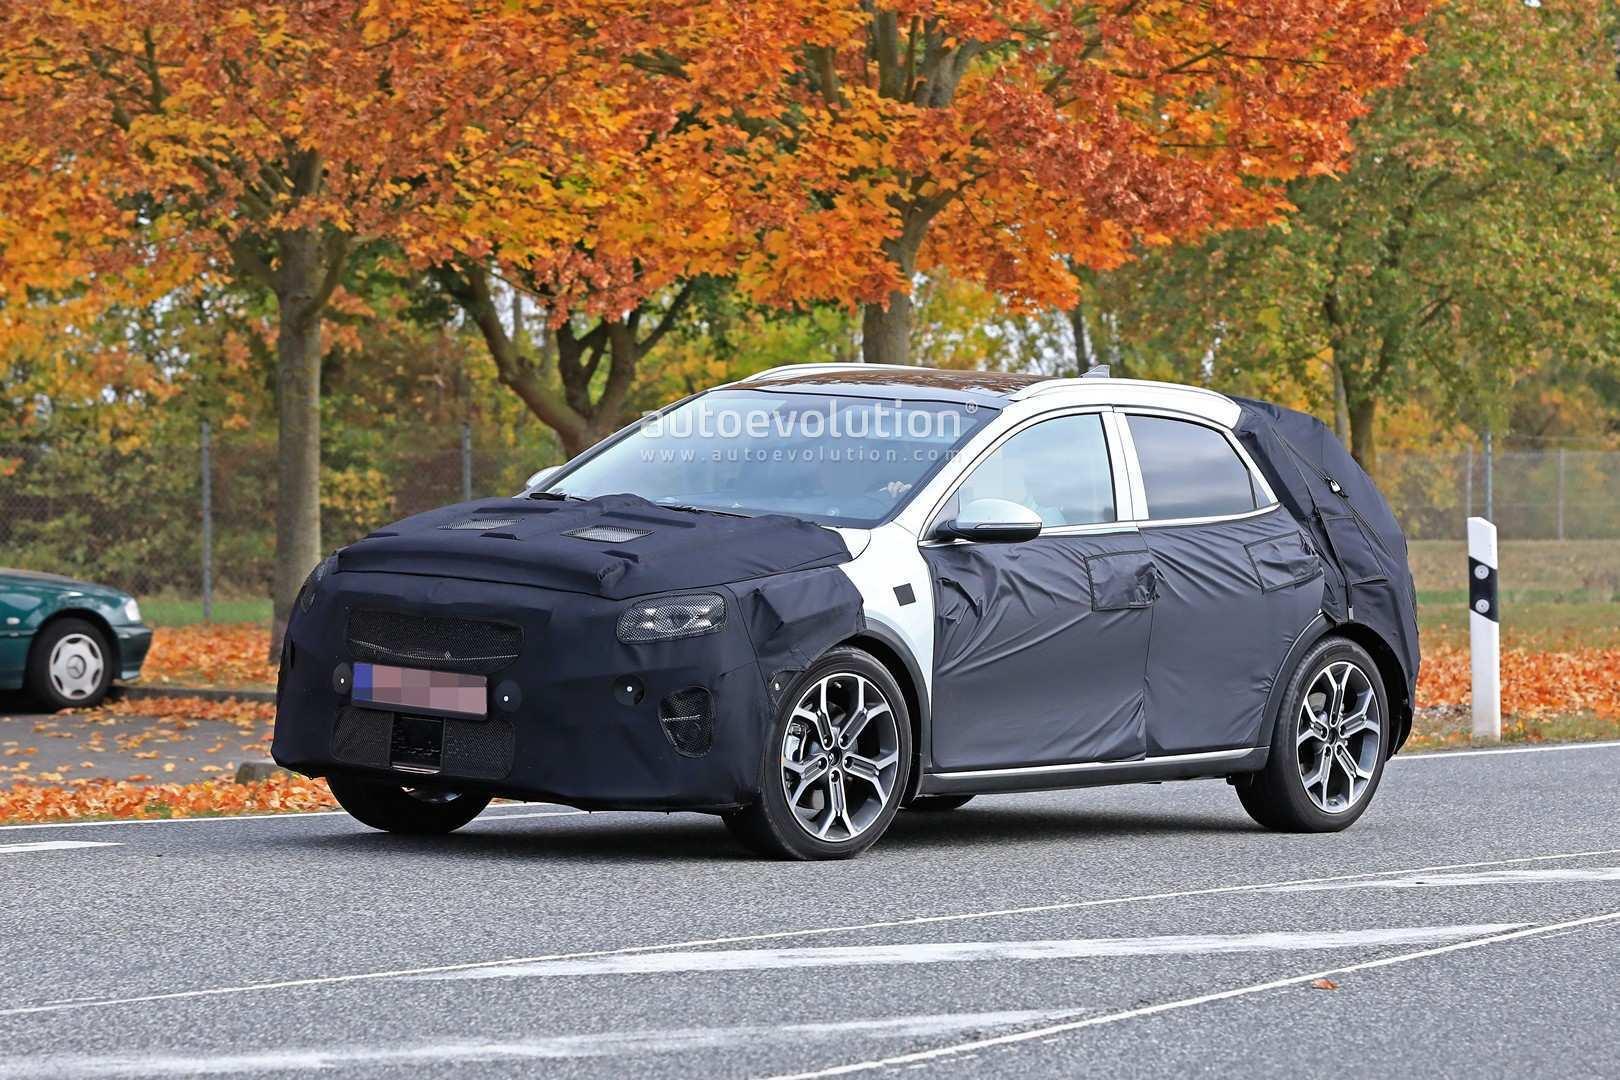 54 New Kia Ceed 2020 Concept for Kia Ceed 2020